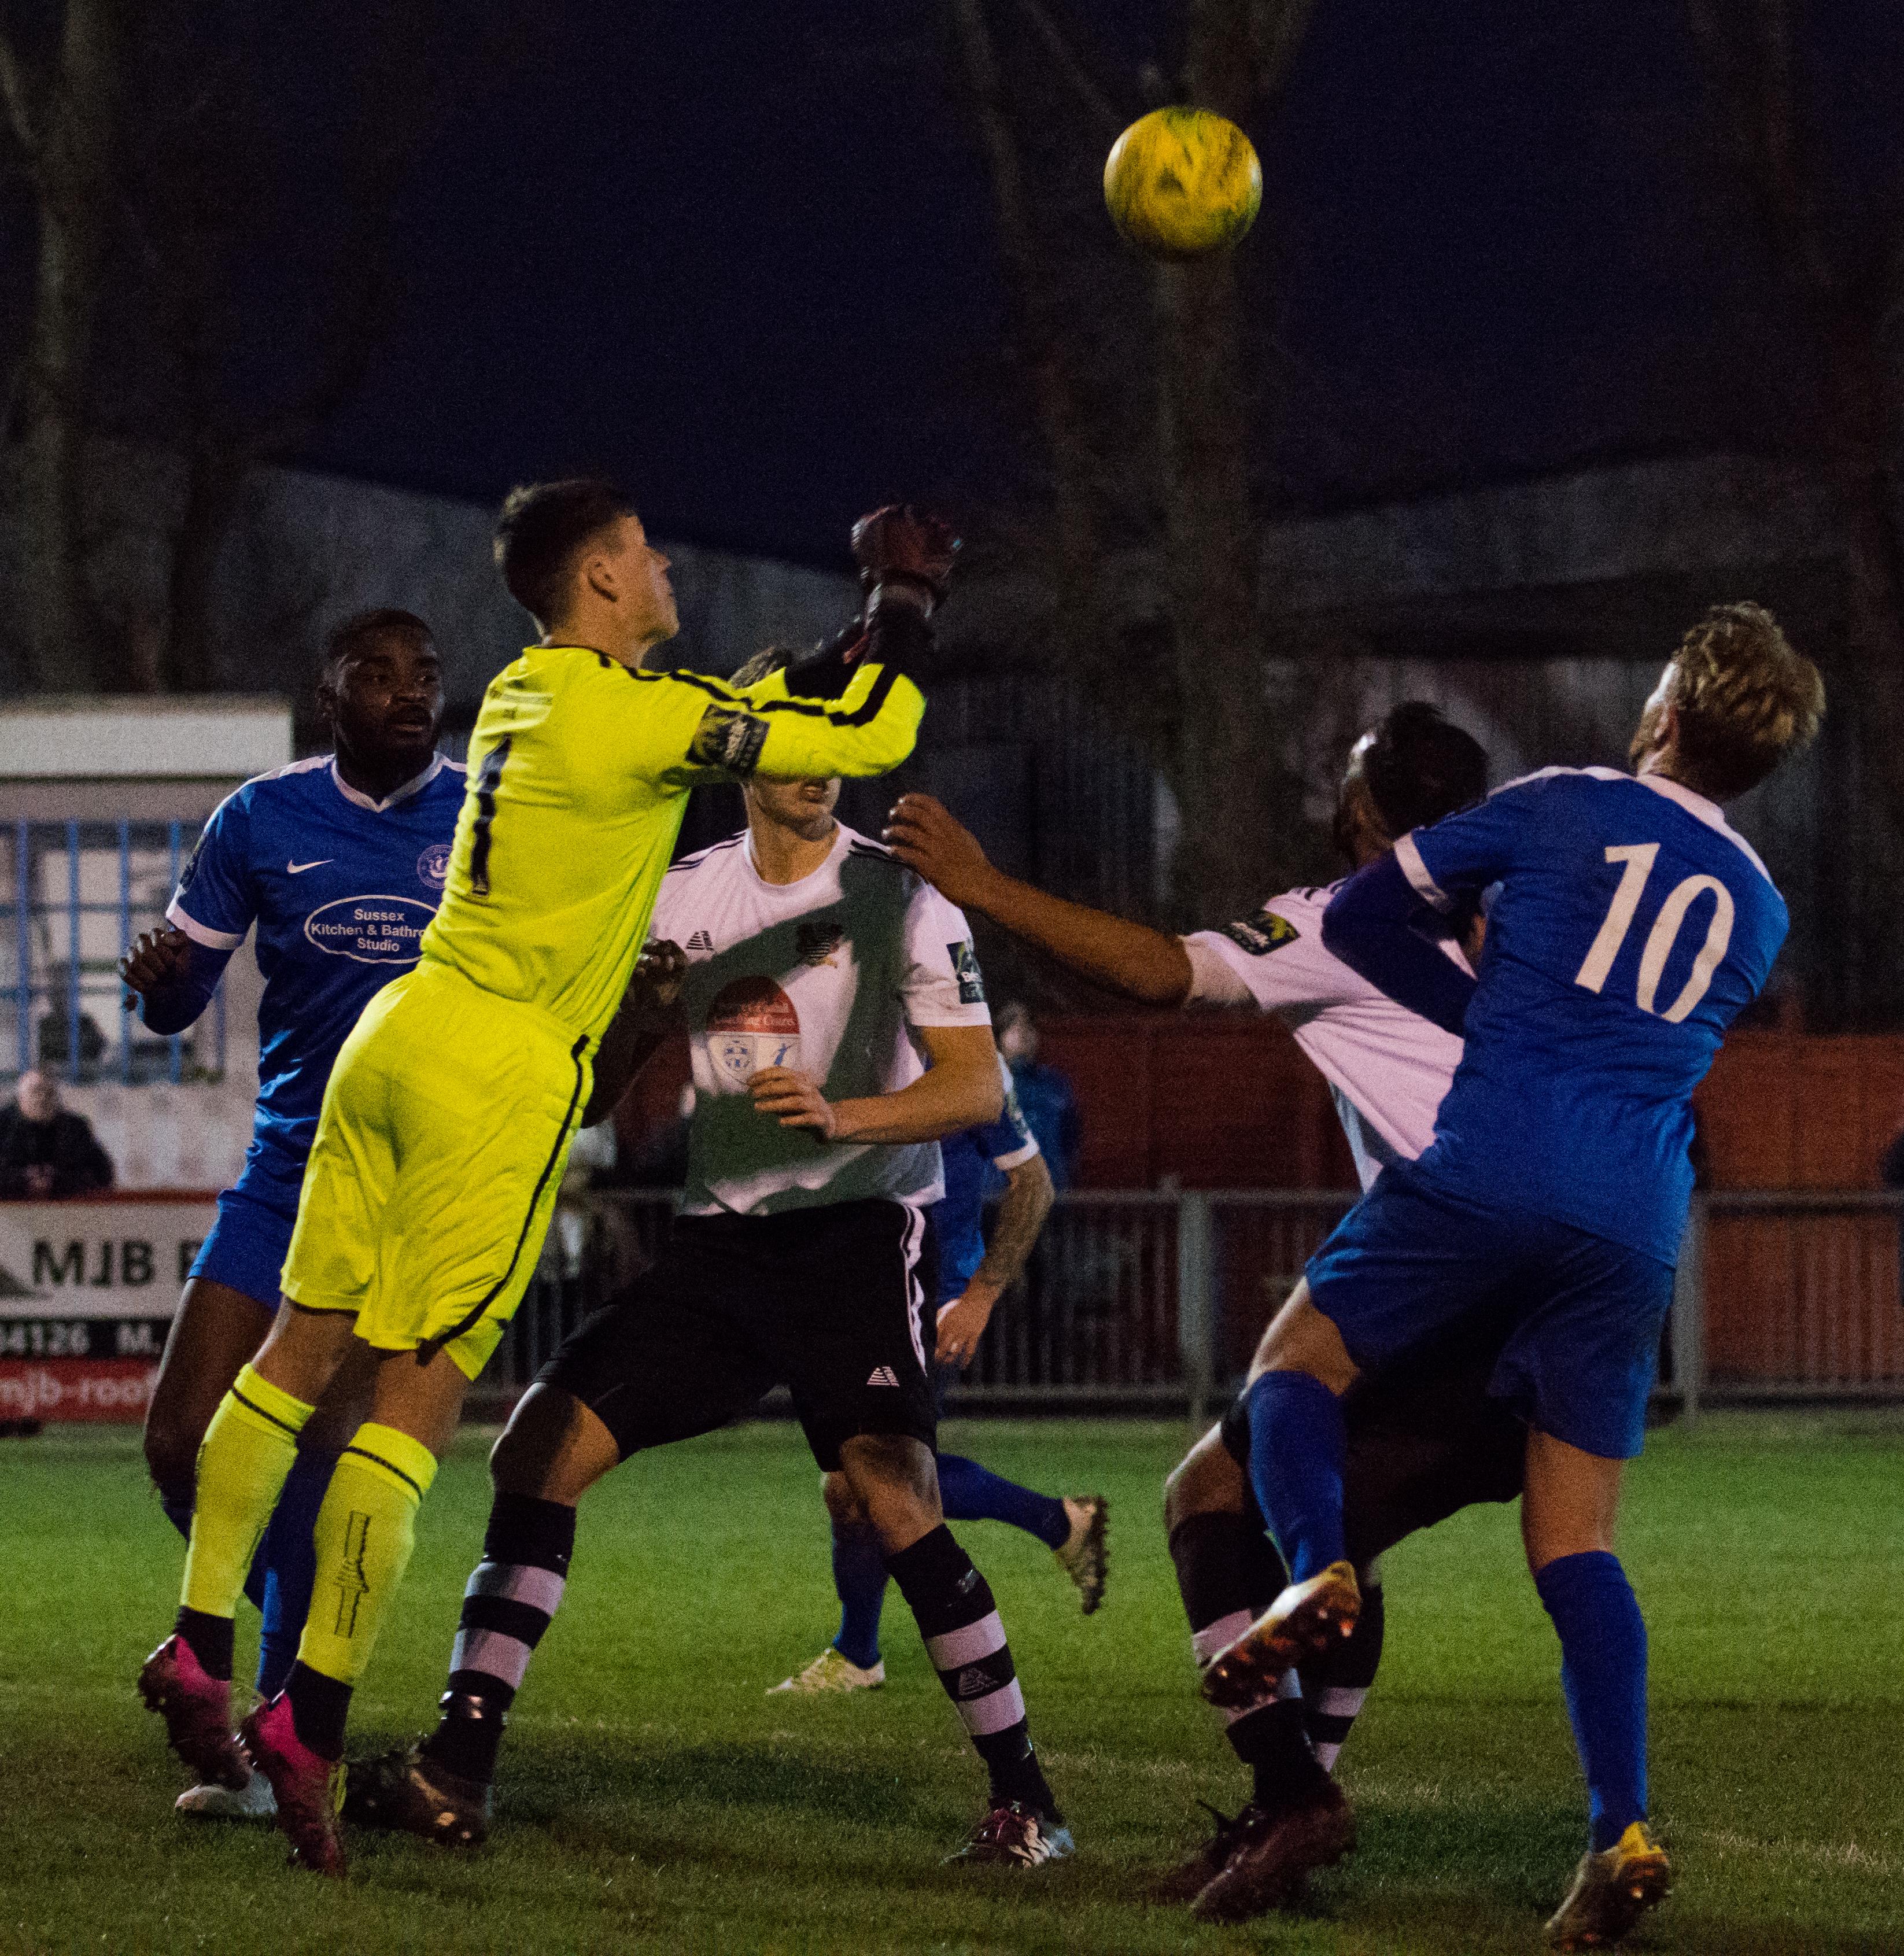 Shoreham FC vs Molesey FC 02.12.17 98